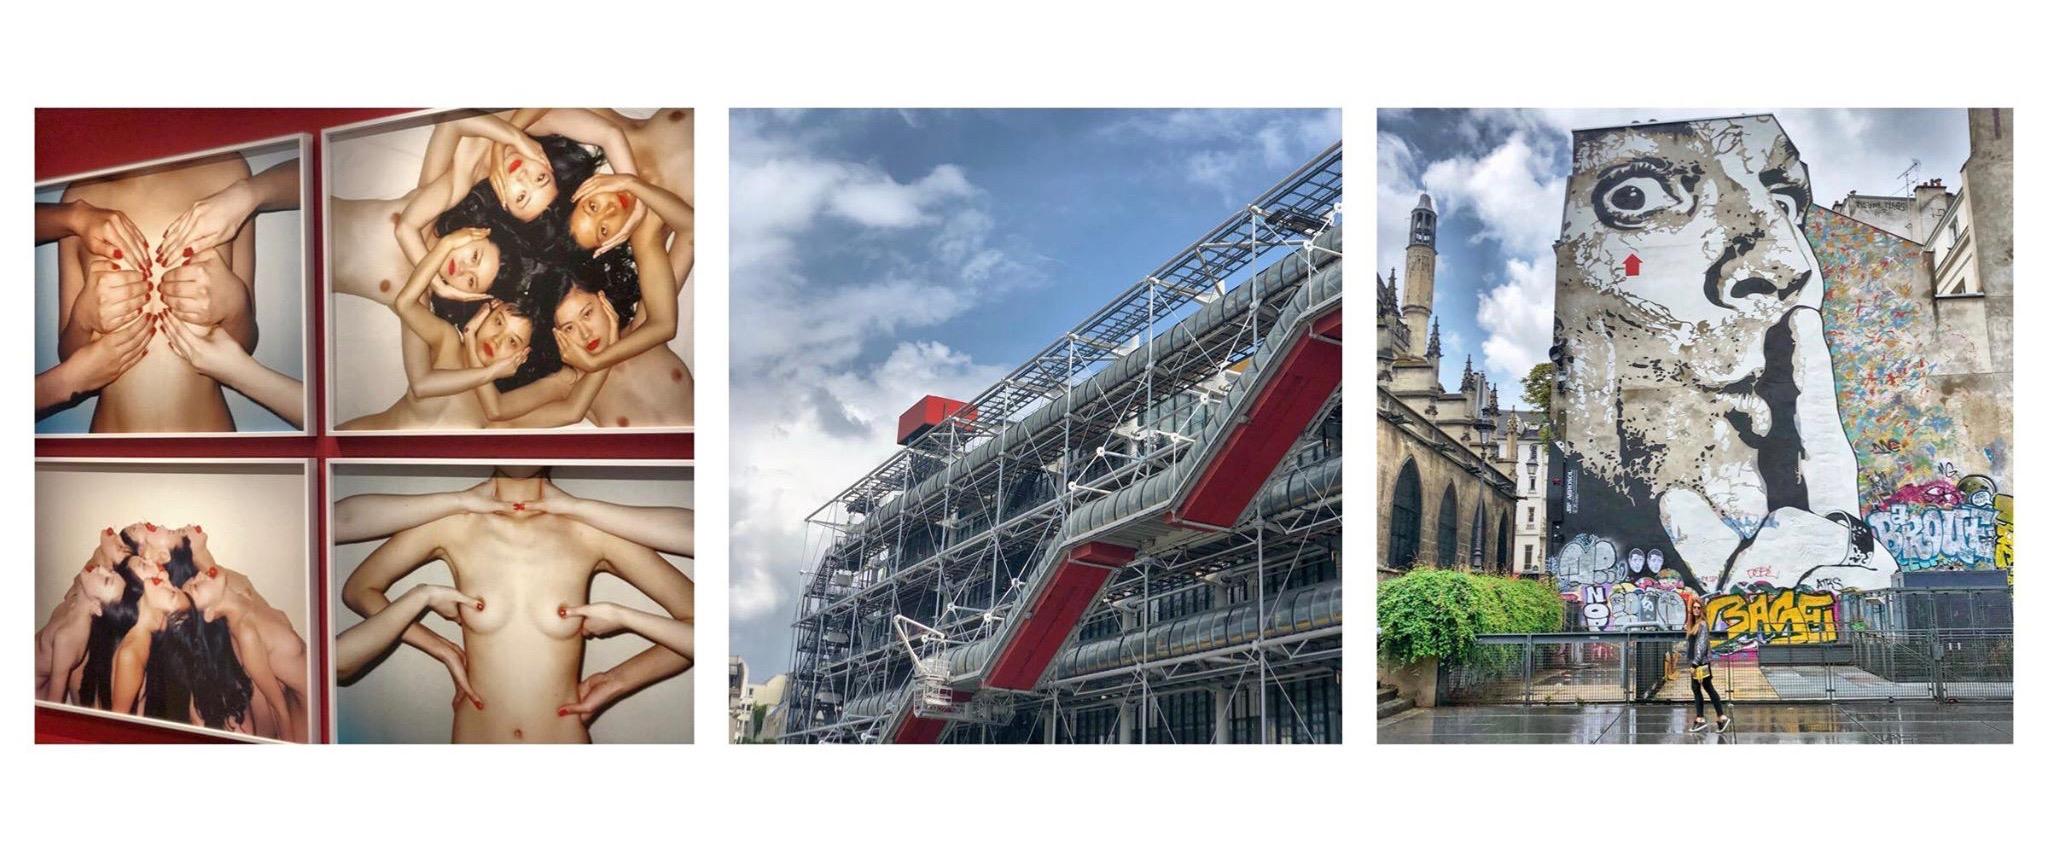 journée paris expo musée street art restaurant